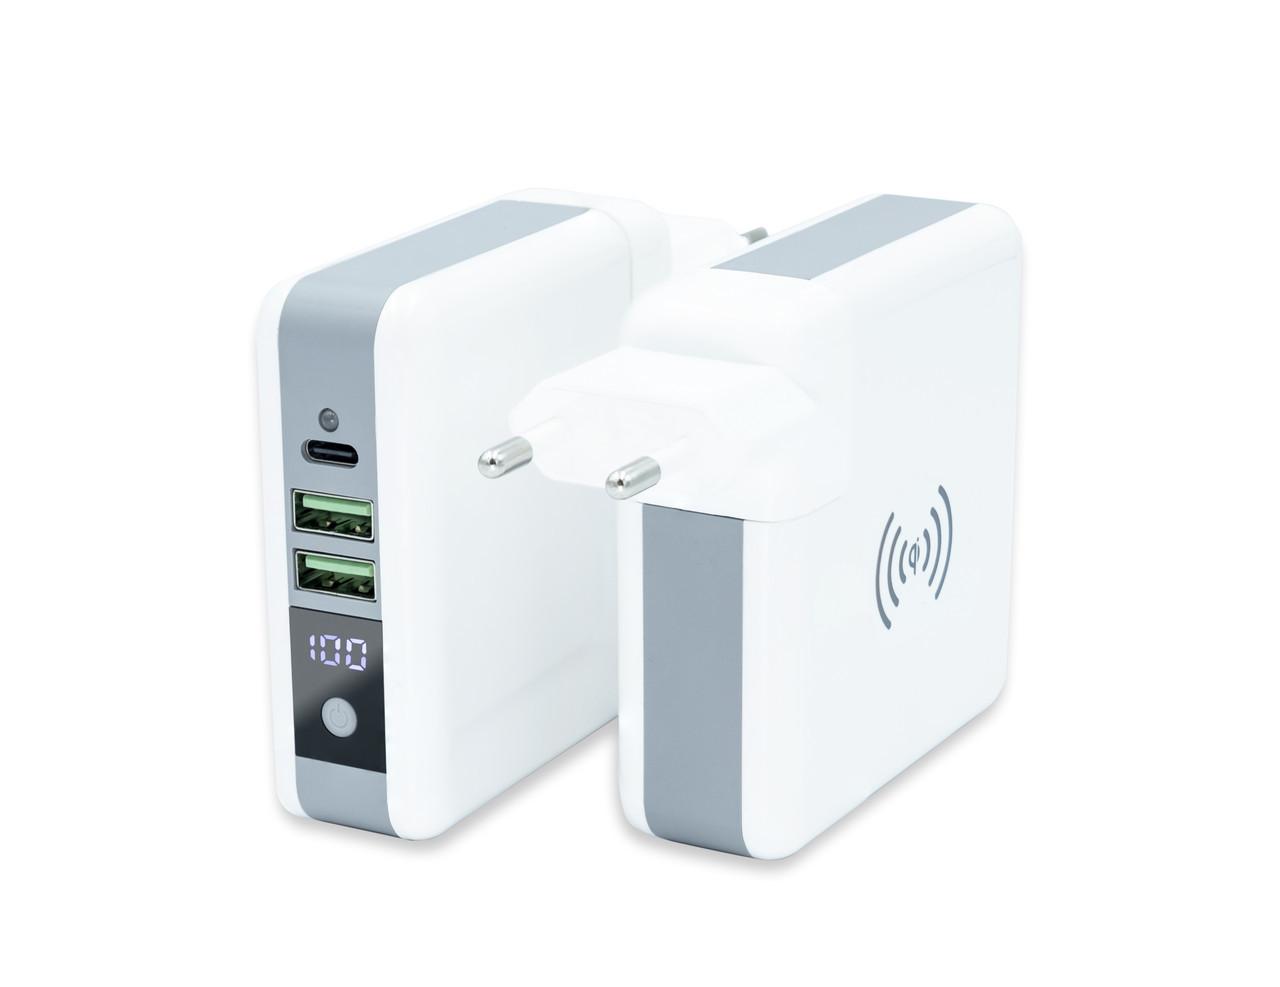 Универсальное зарядное устройство Qitech Travel Bank Charger 3 in 1 White (QT-TB01wh)